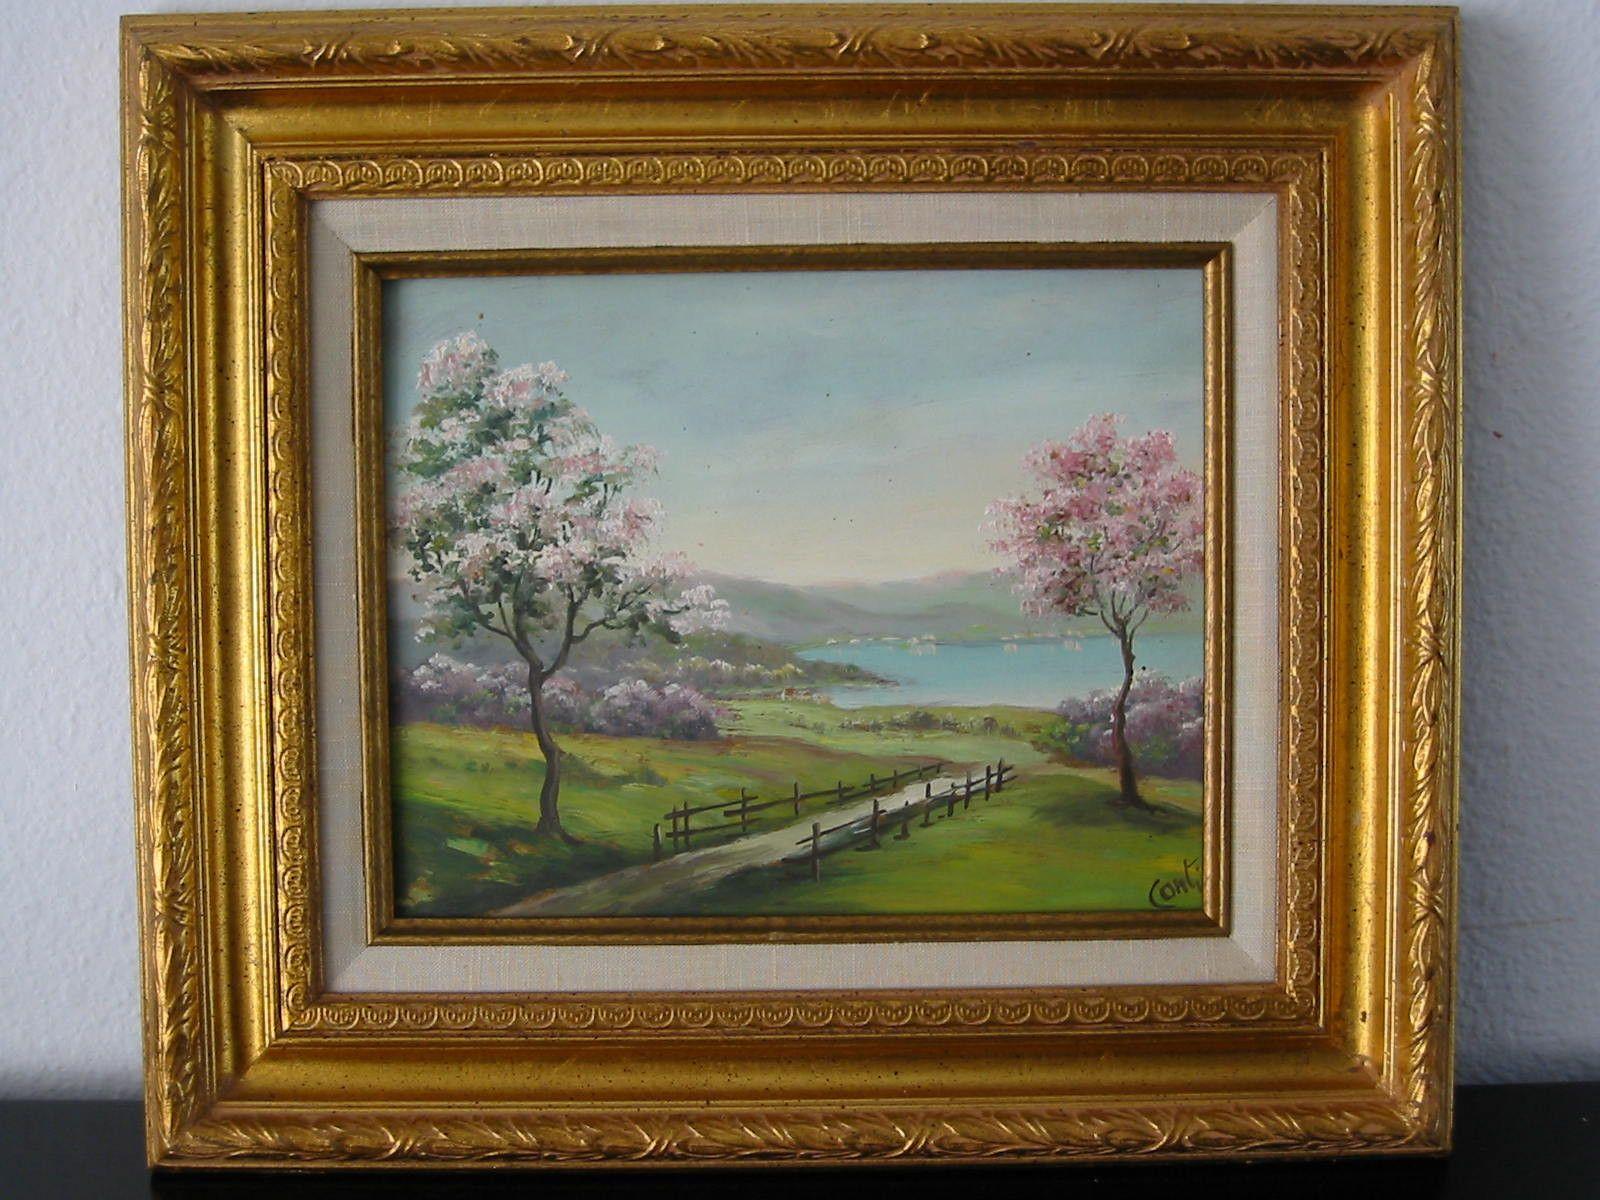 Conti Impressionist Landscape The Trees Oil On Board | Impressionist ...